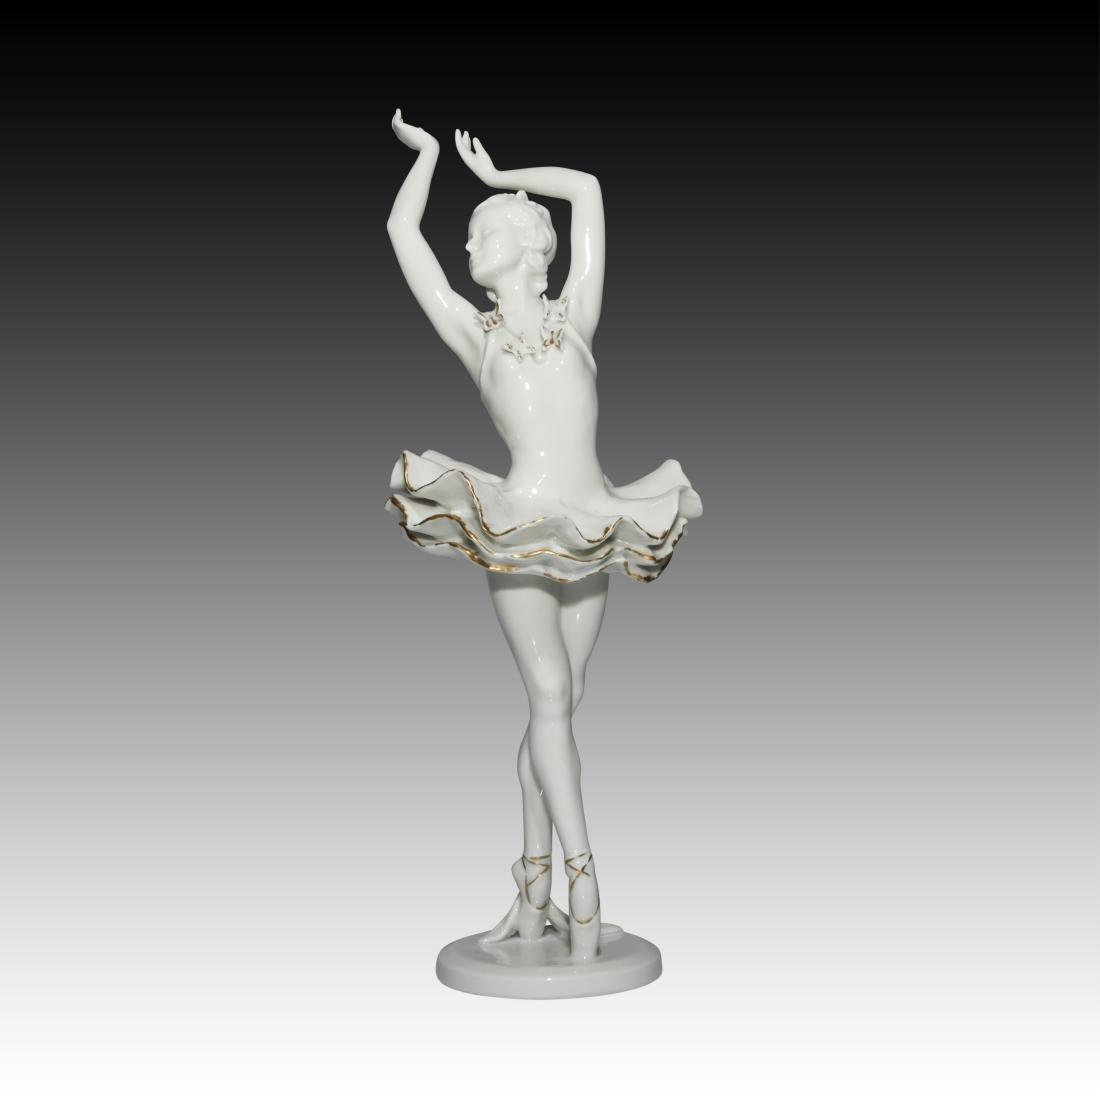 Rosenthal Female Ballerina Figurine - 2